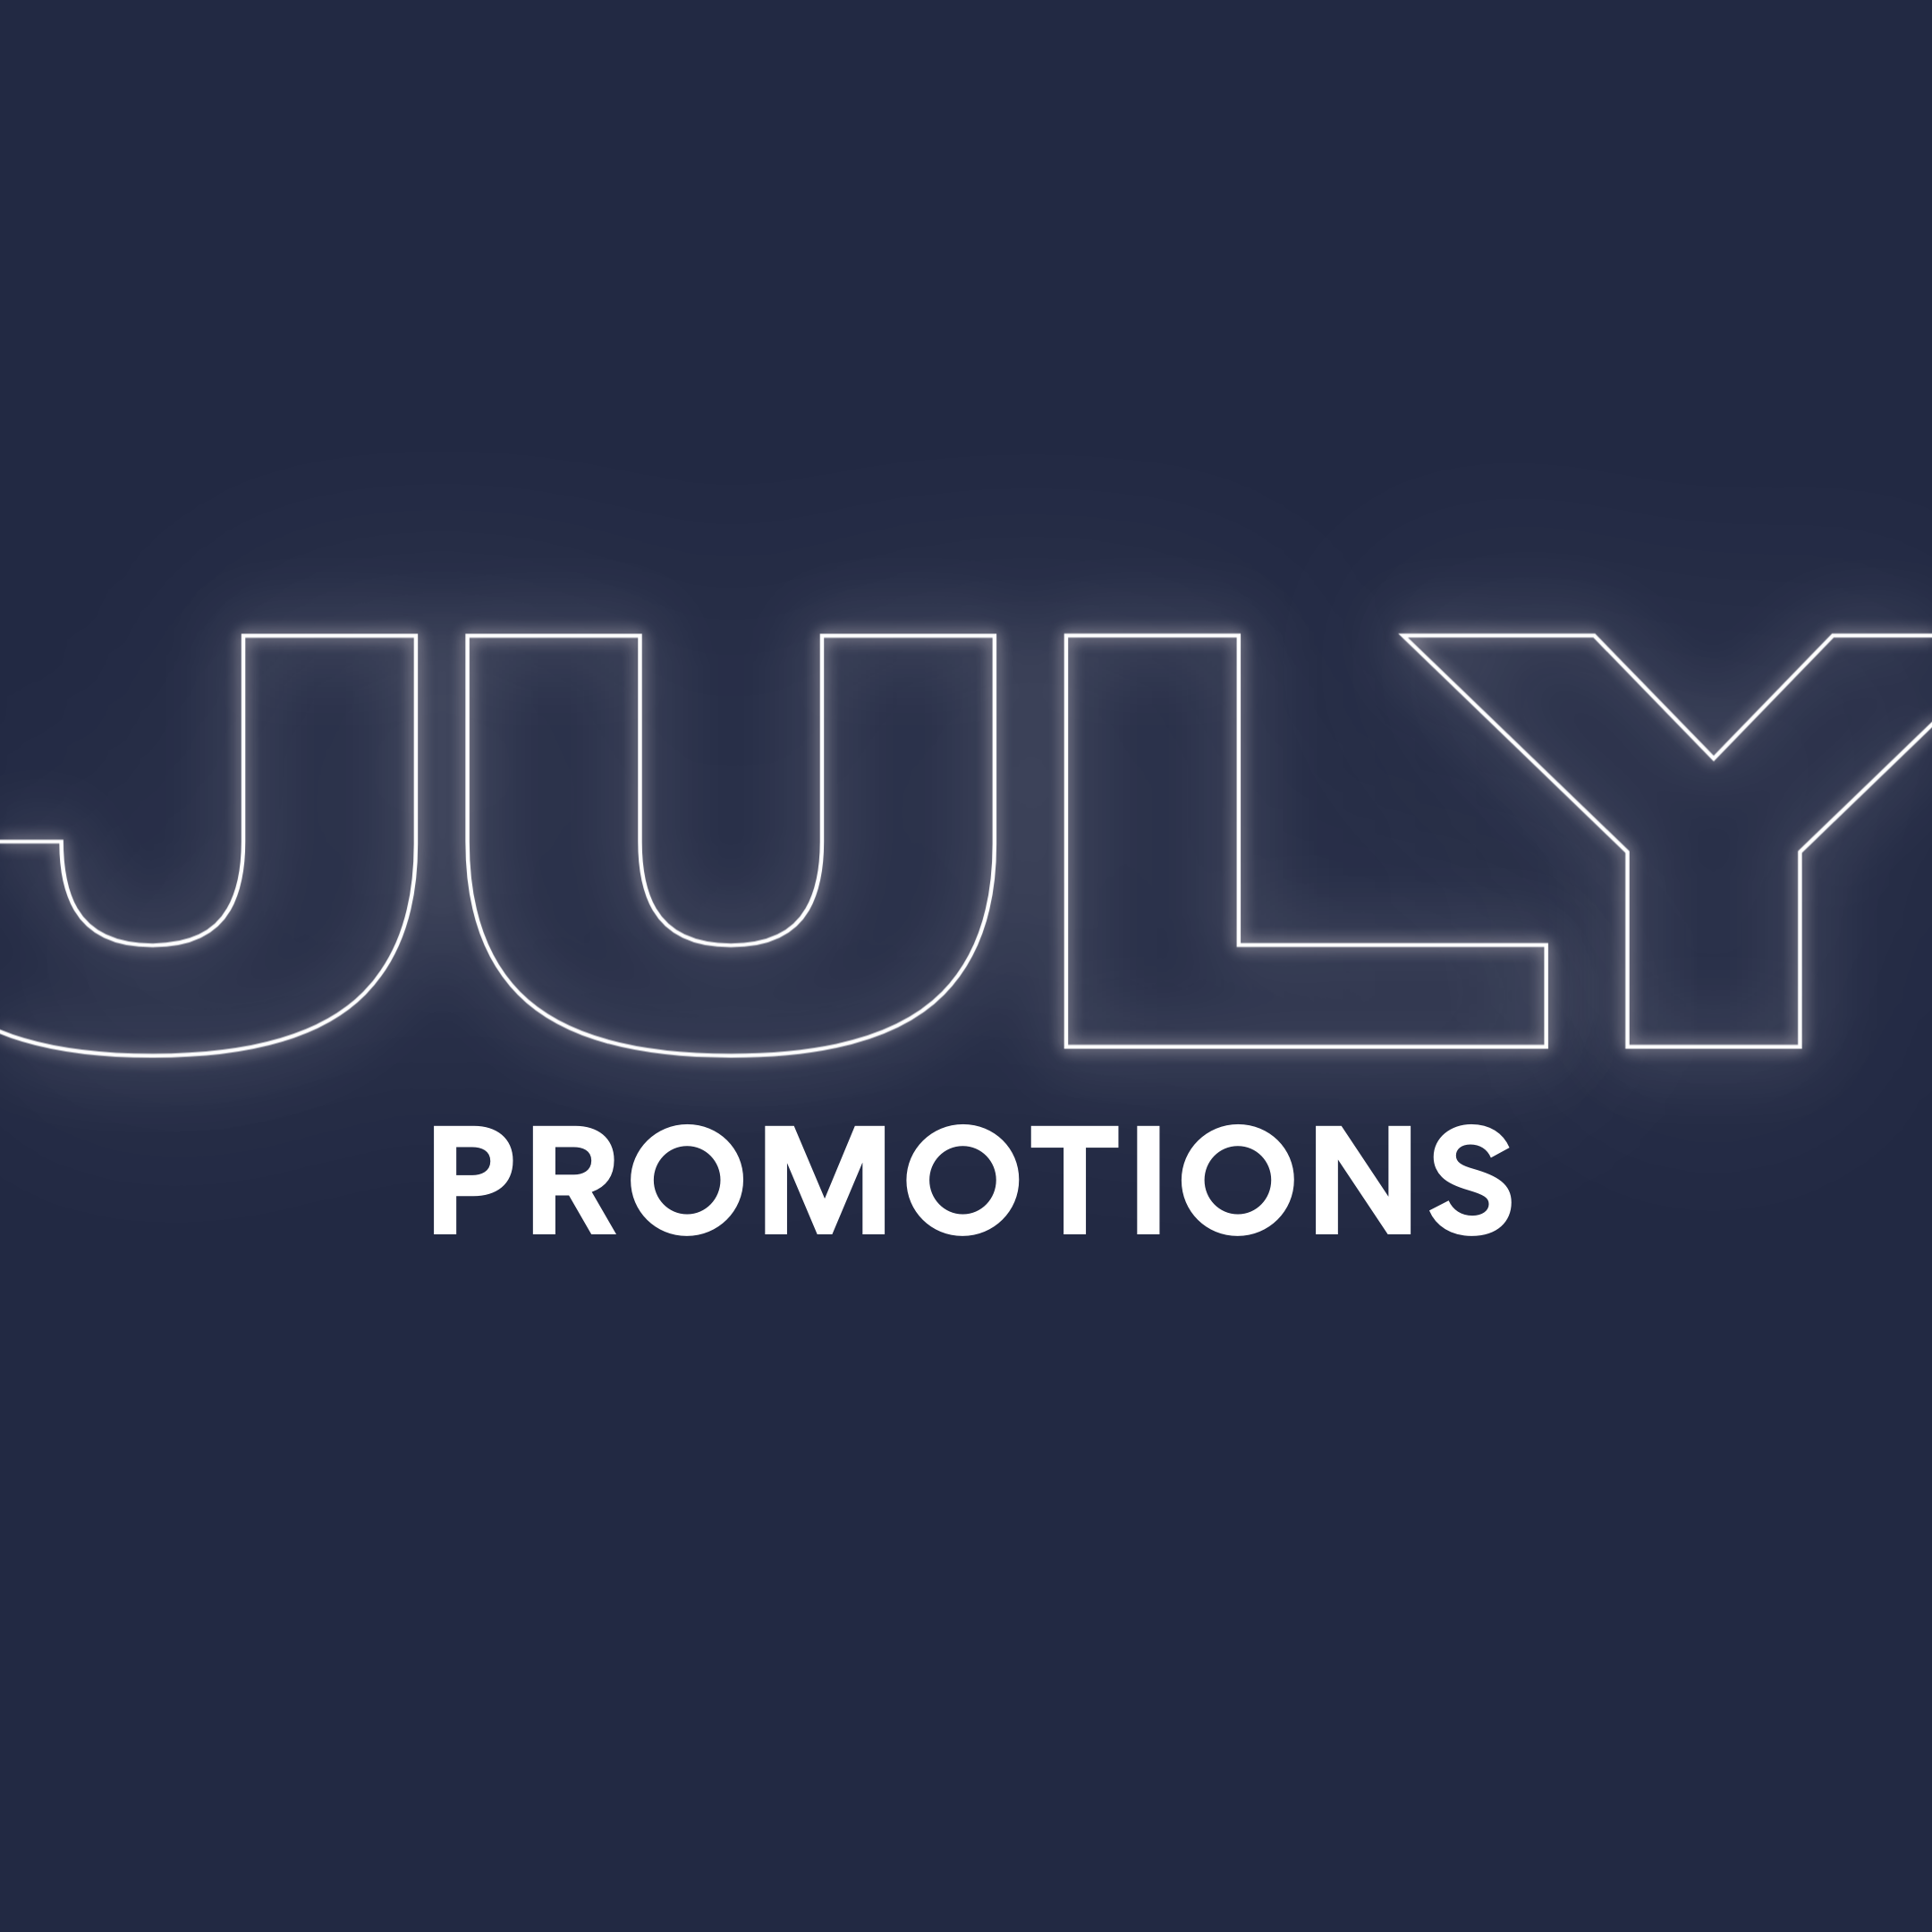 July Promos Square